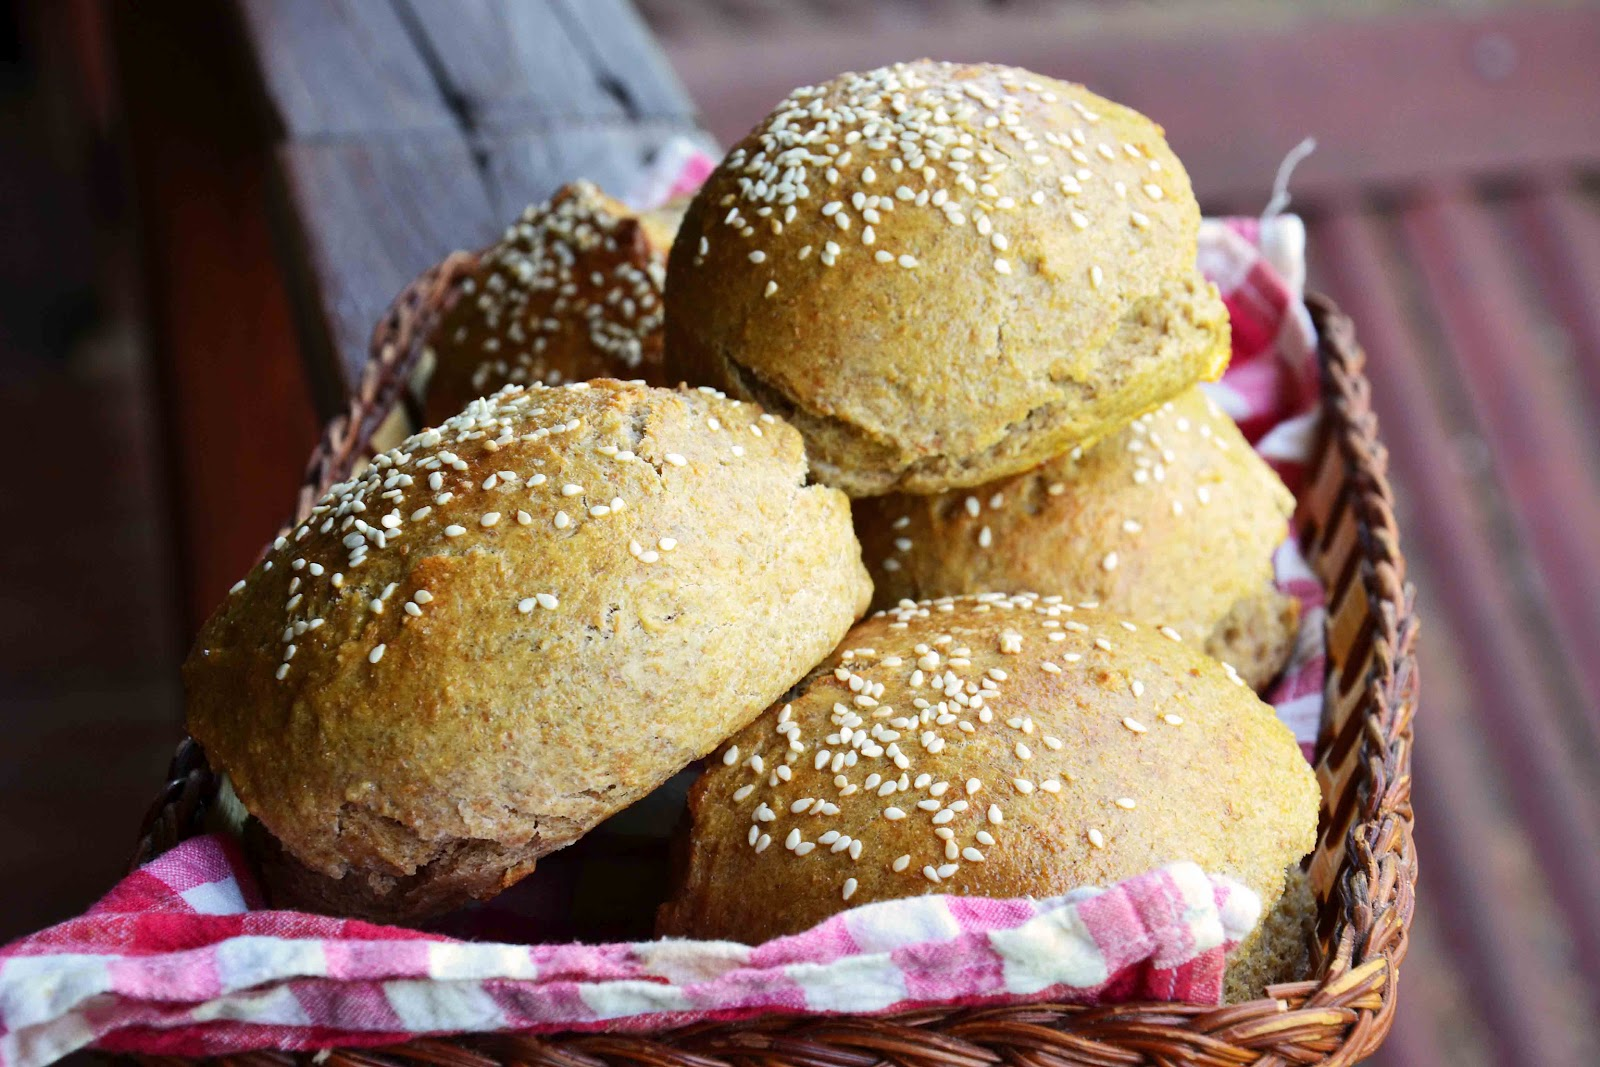 ... buns hot dog buns everything buns smoked rye buns hot cross buns